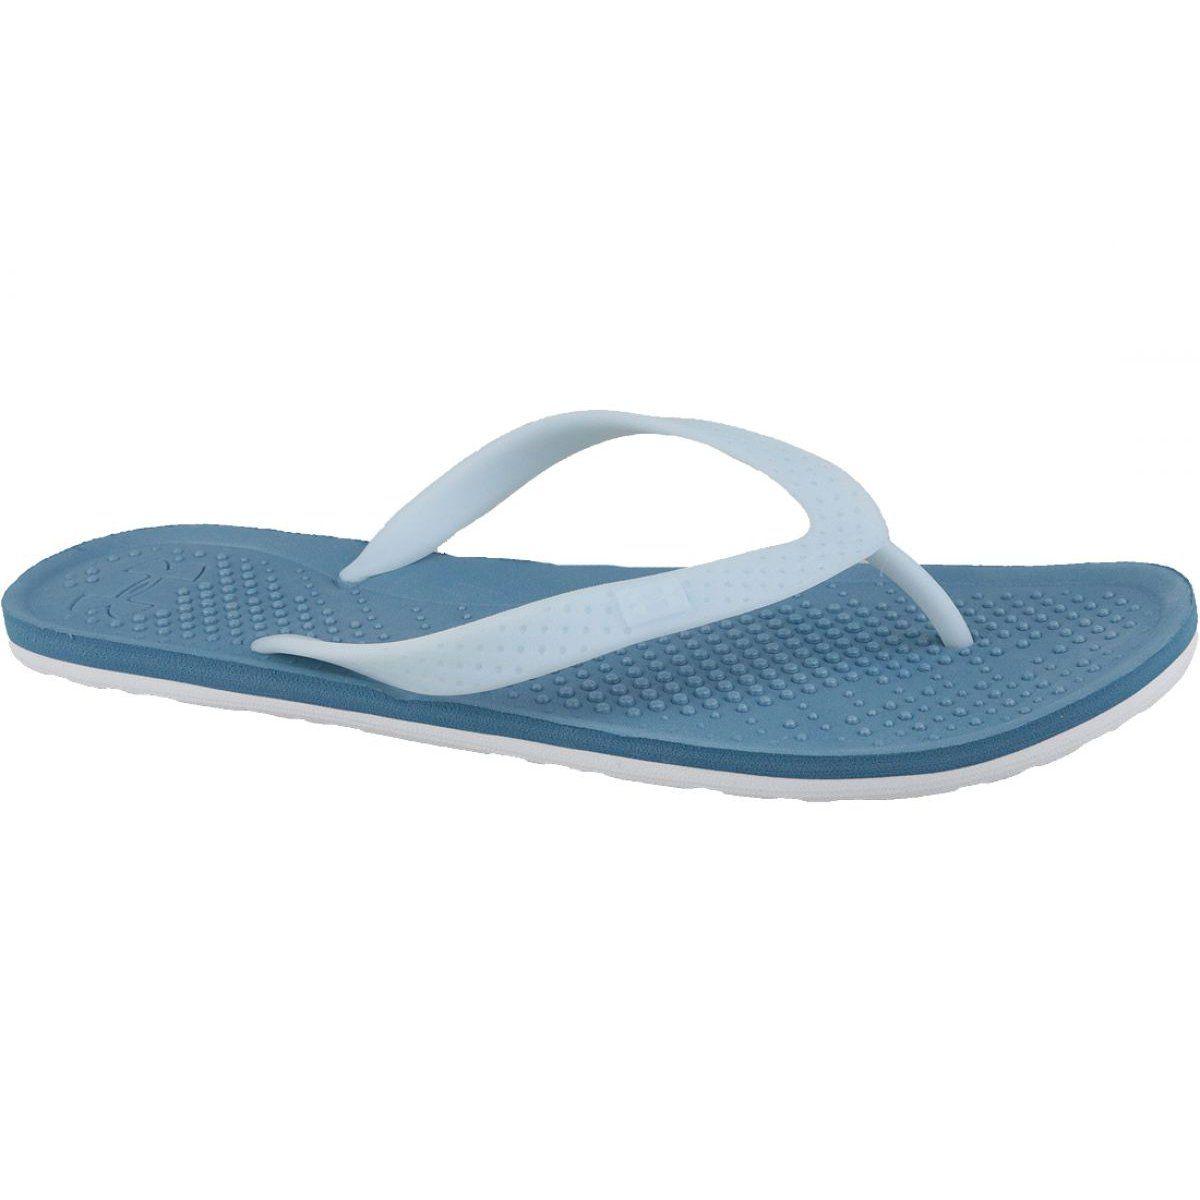 Under Armour Mens Flip Flops Atlantic Dune Summer Beach Shoes Thong Sandals